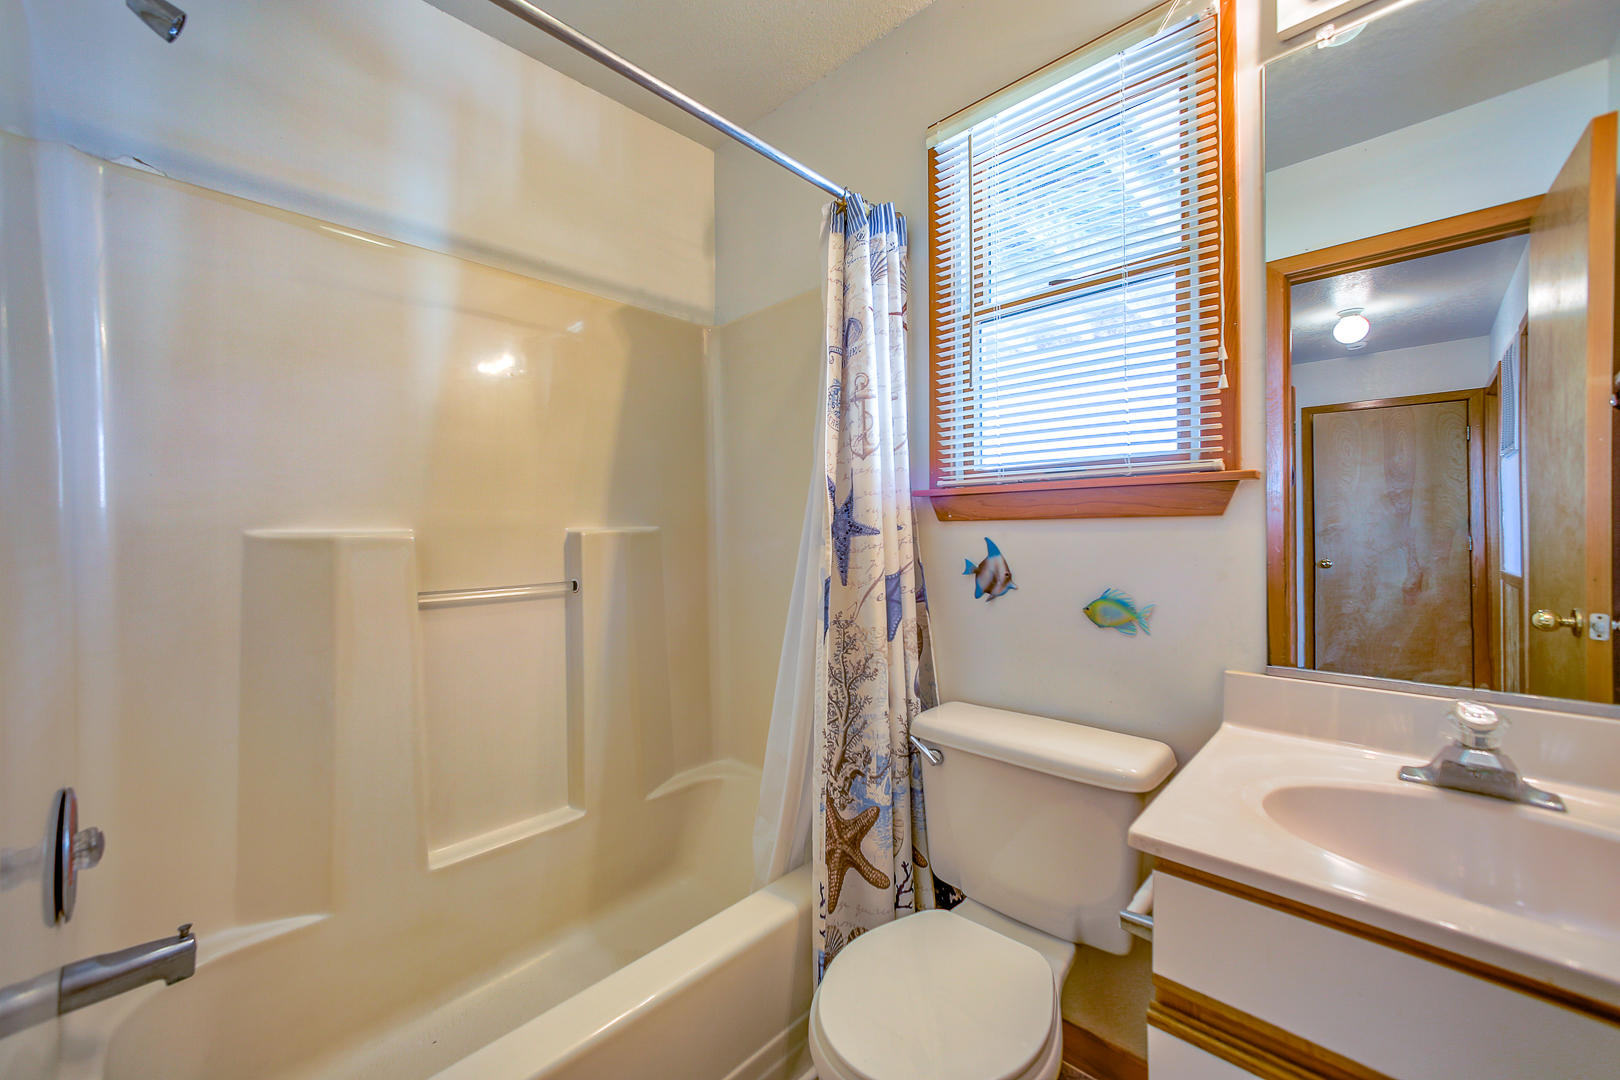 Middle level shared bathroom near laundry room